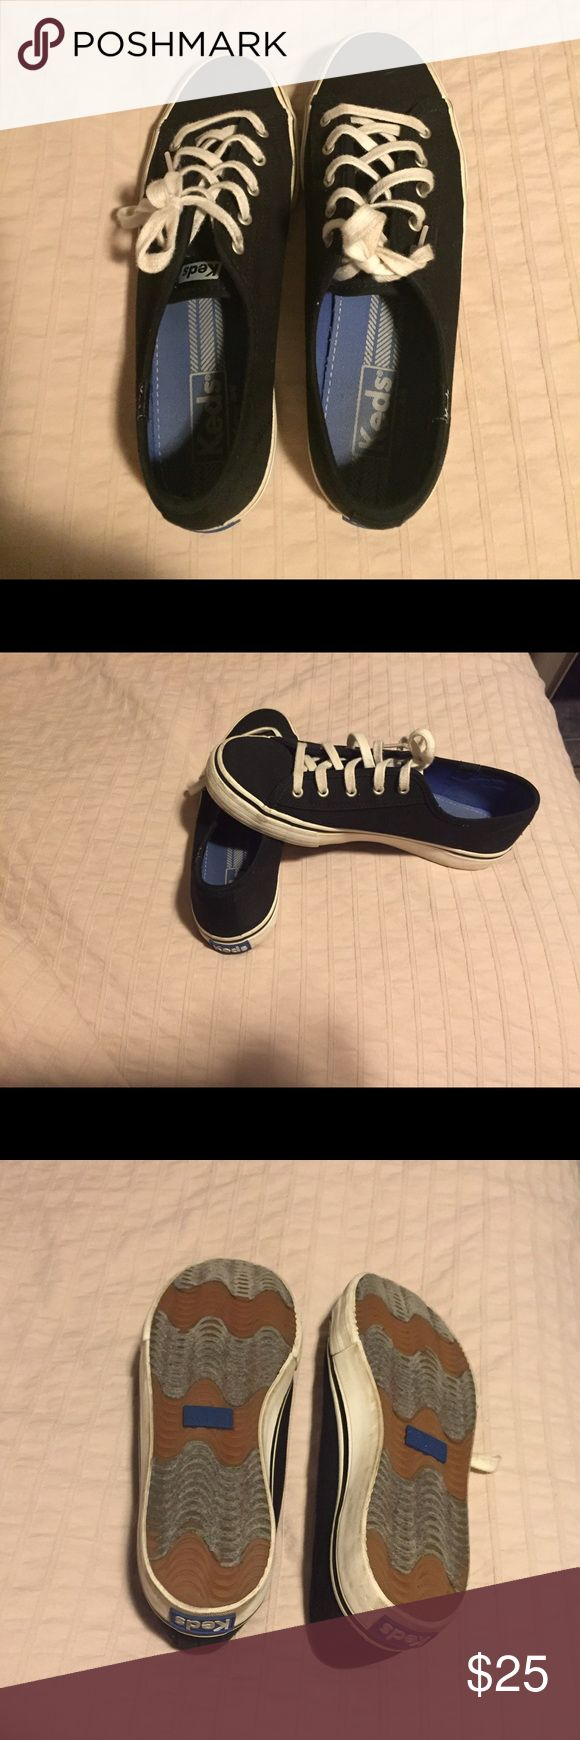 Keds tennis size 7.5 Black tennis shoes good condition Shoes Sneakers